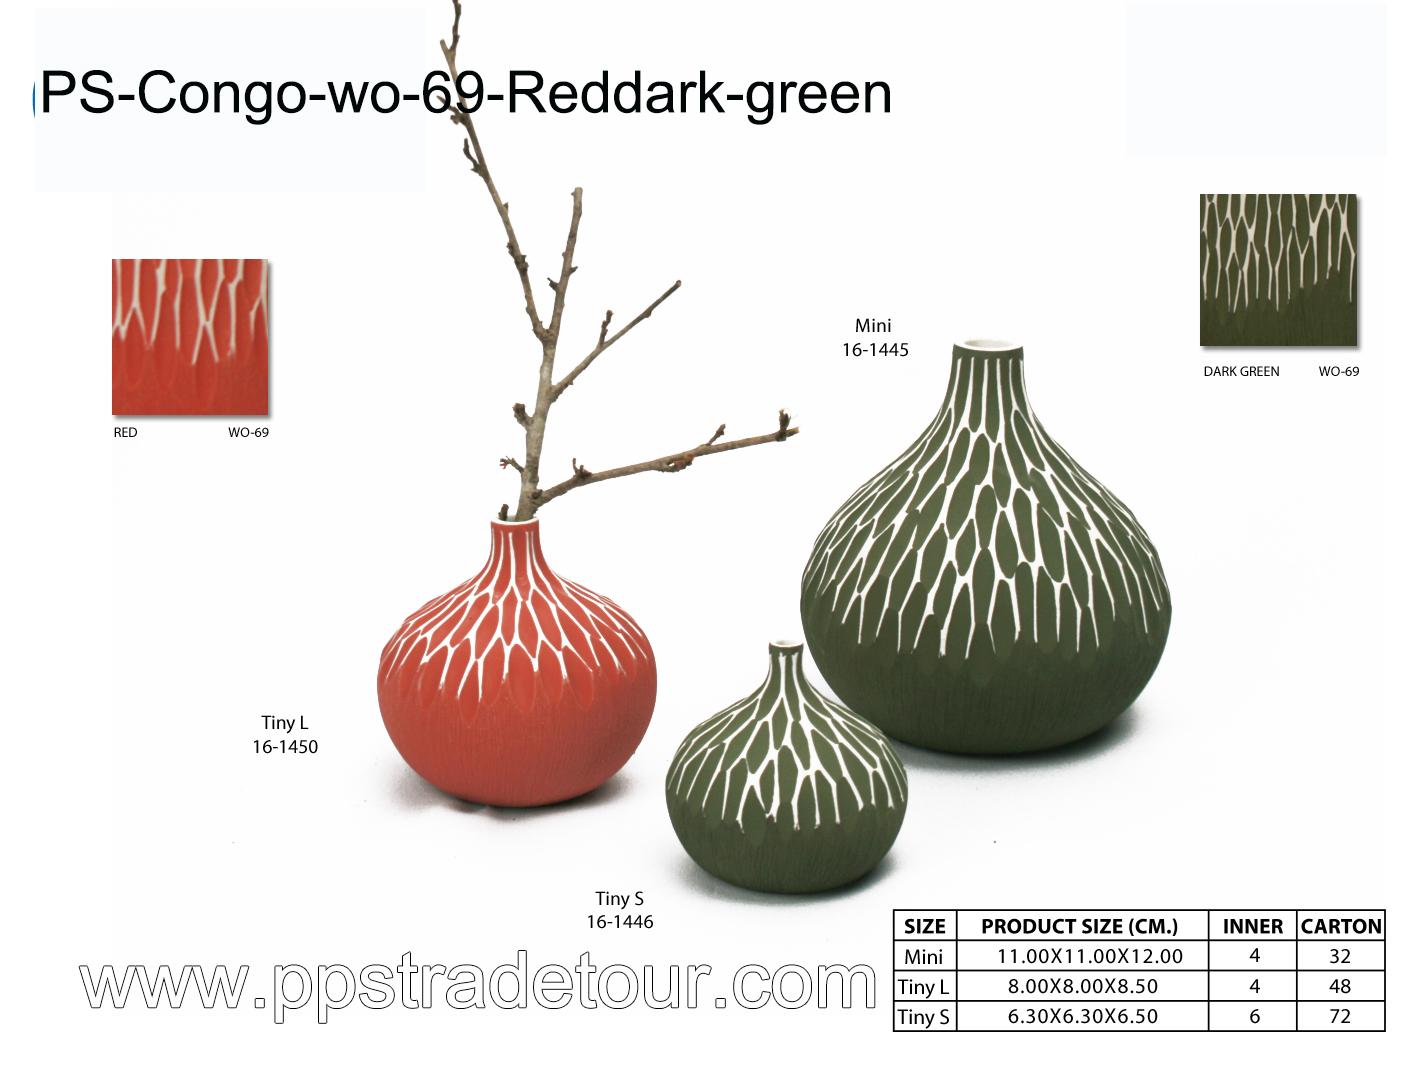 PSCV-Congo-wo-69-REDDark-green